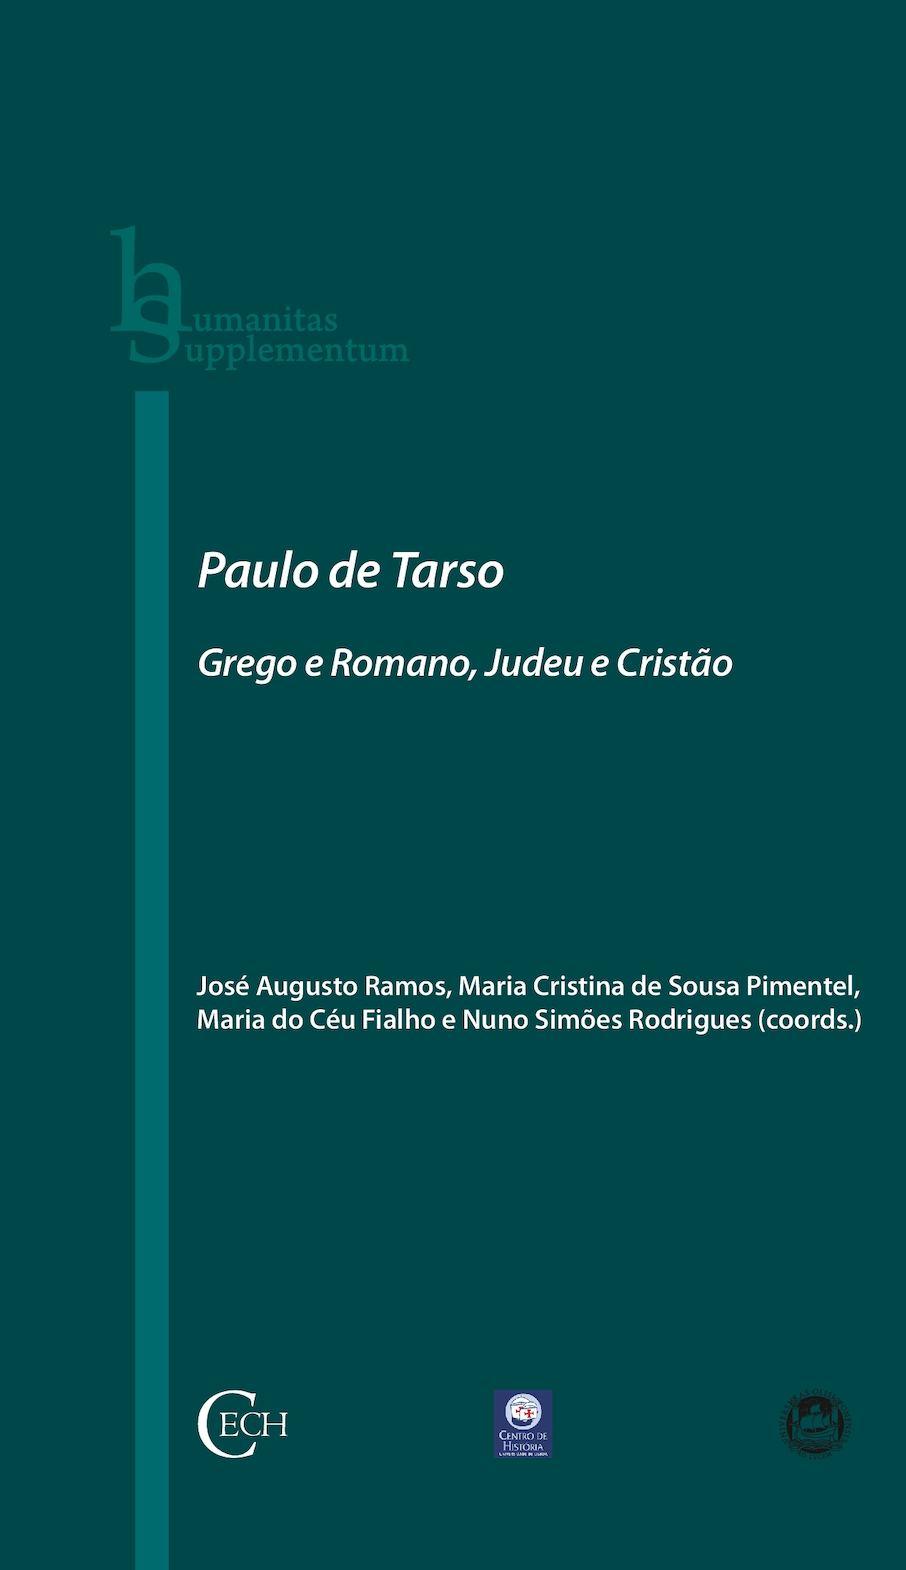 40c1331e9f8 Calaméo - Paulo De Tarso - Grego E Romano